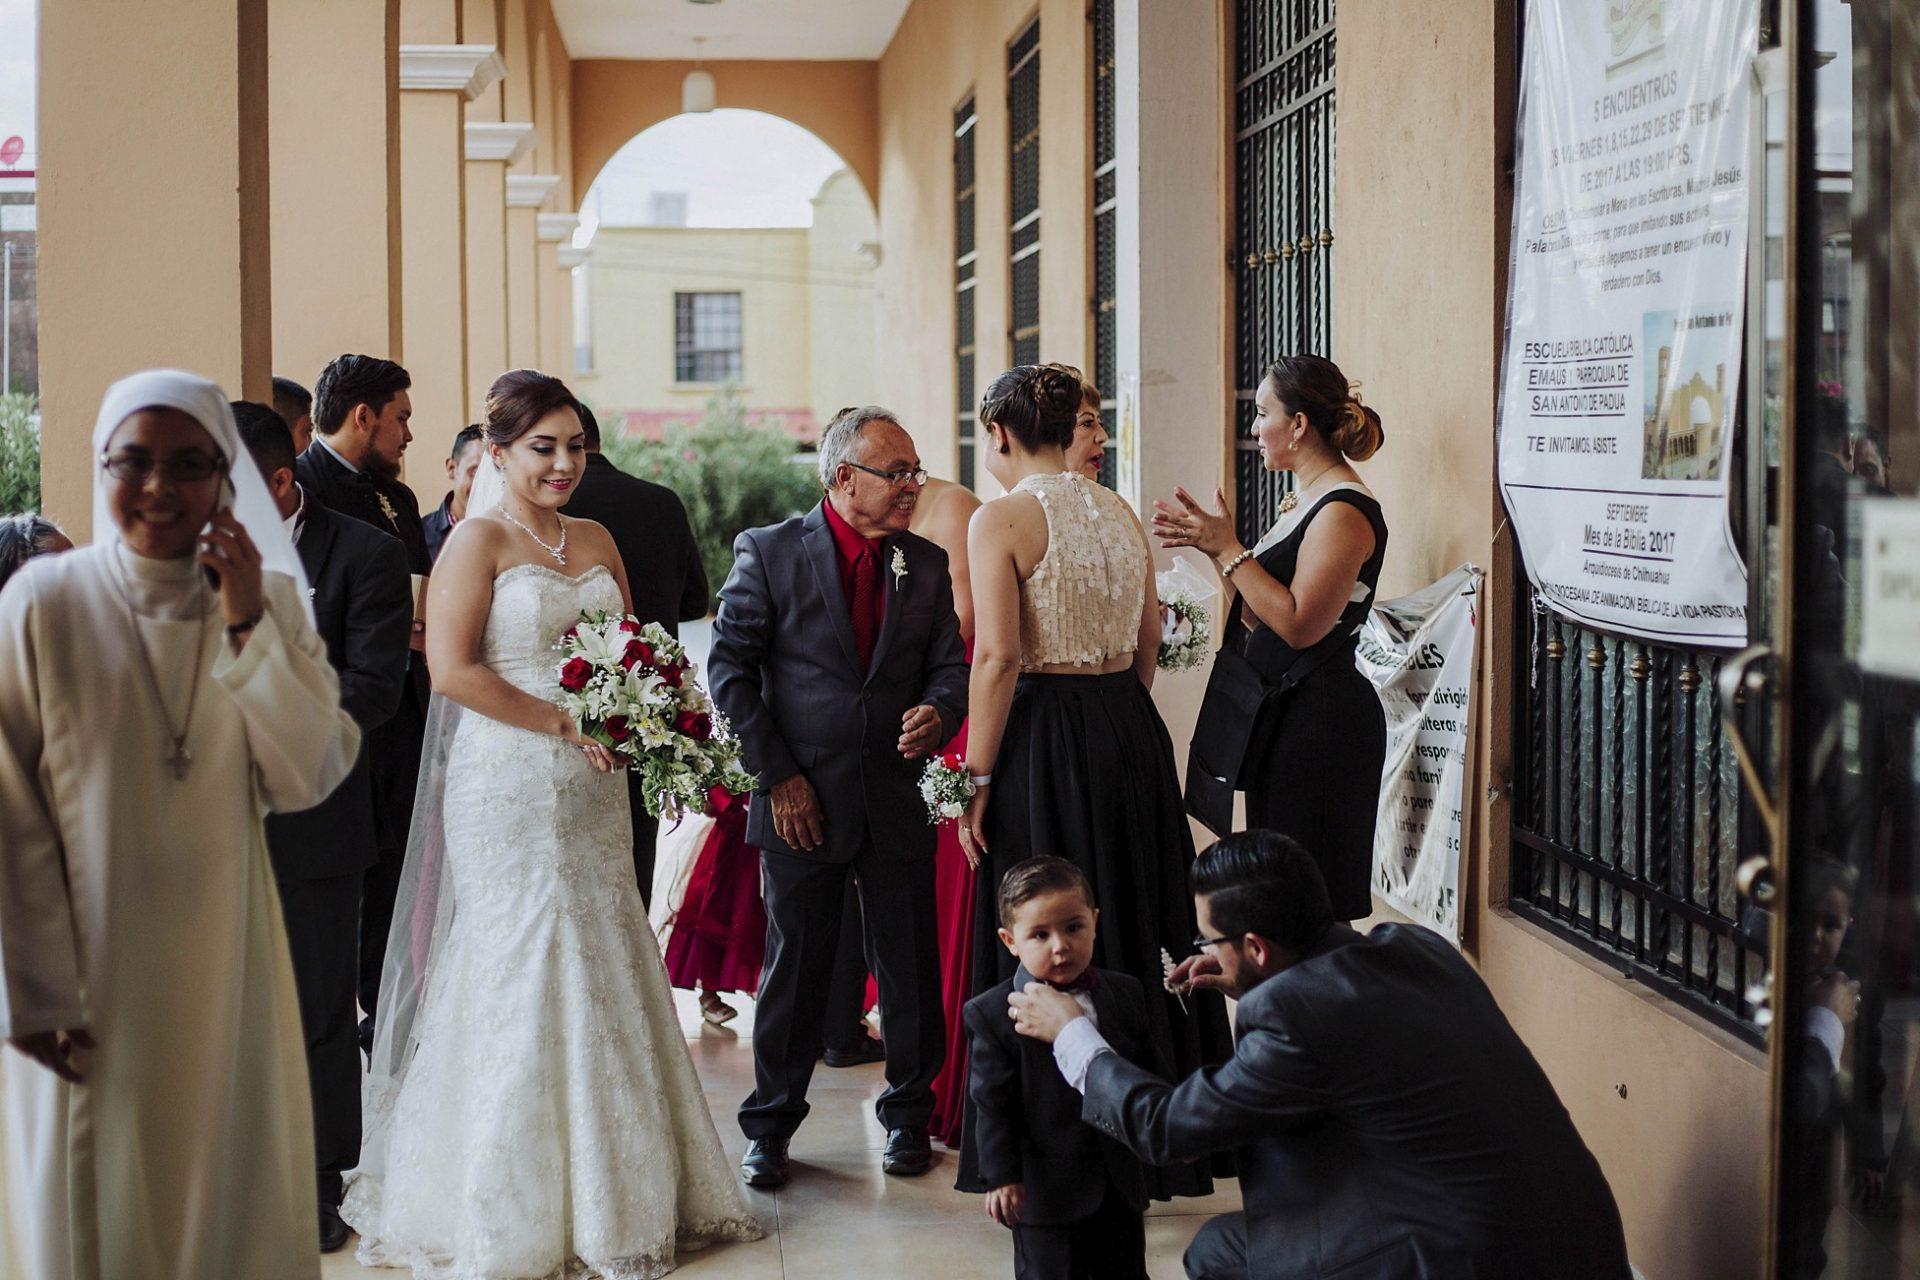 fotografo_profesional_bodas_xv_chihuahua_zacatecas_mexico-35